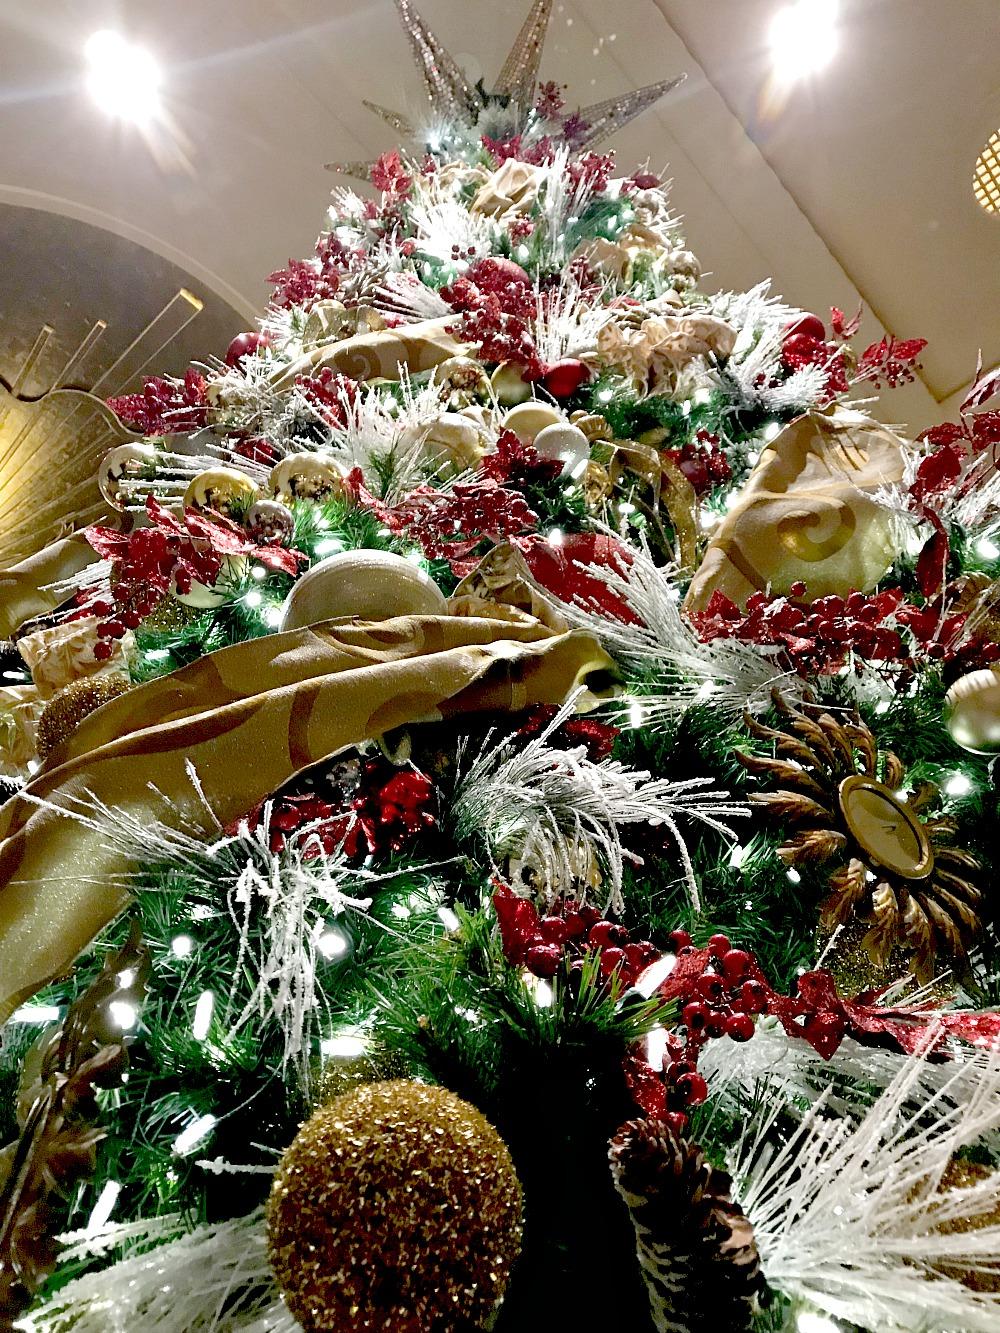 The Christmas tree at The Peninsula Hotel